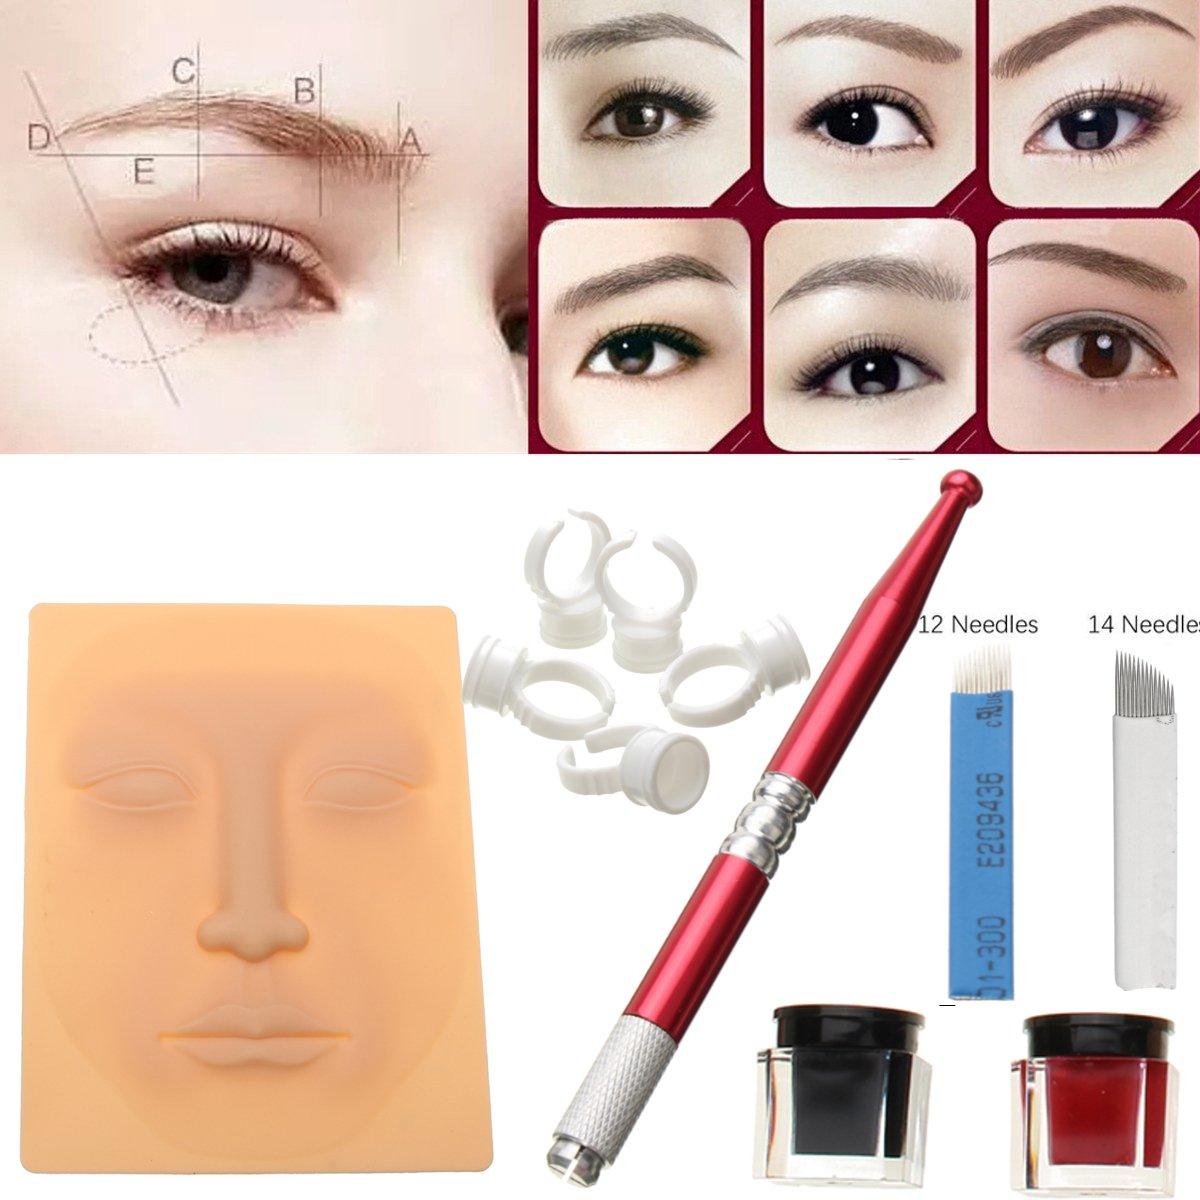 Amazon.com: Microblading Kit Eyebrow Tattoo Permanent Makeup Set ...